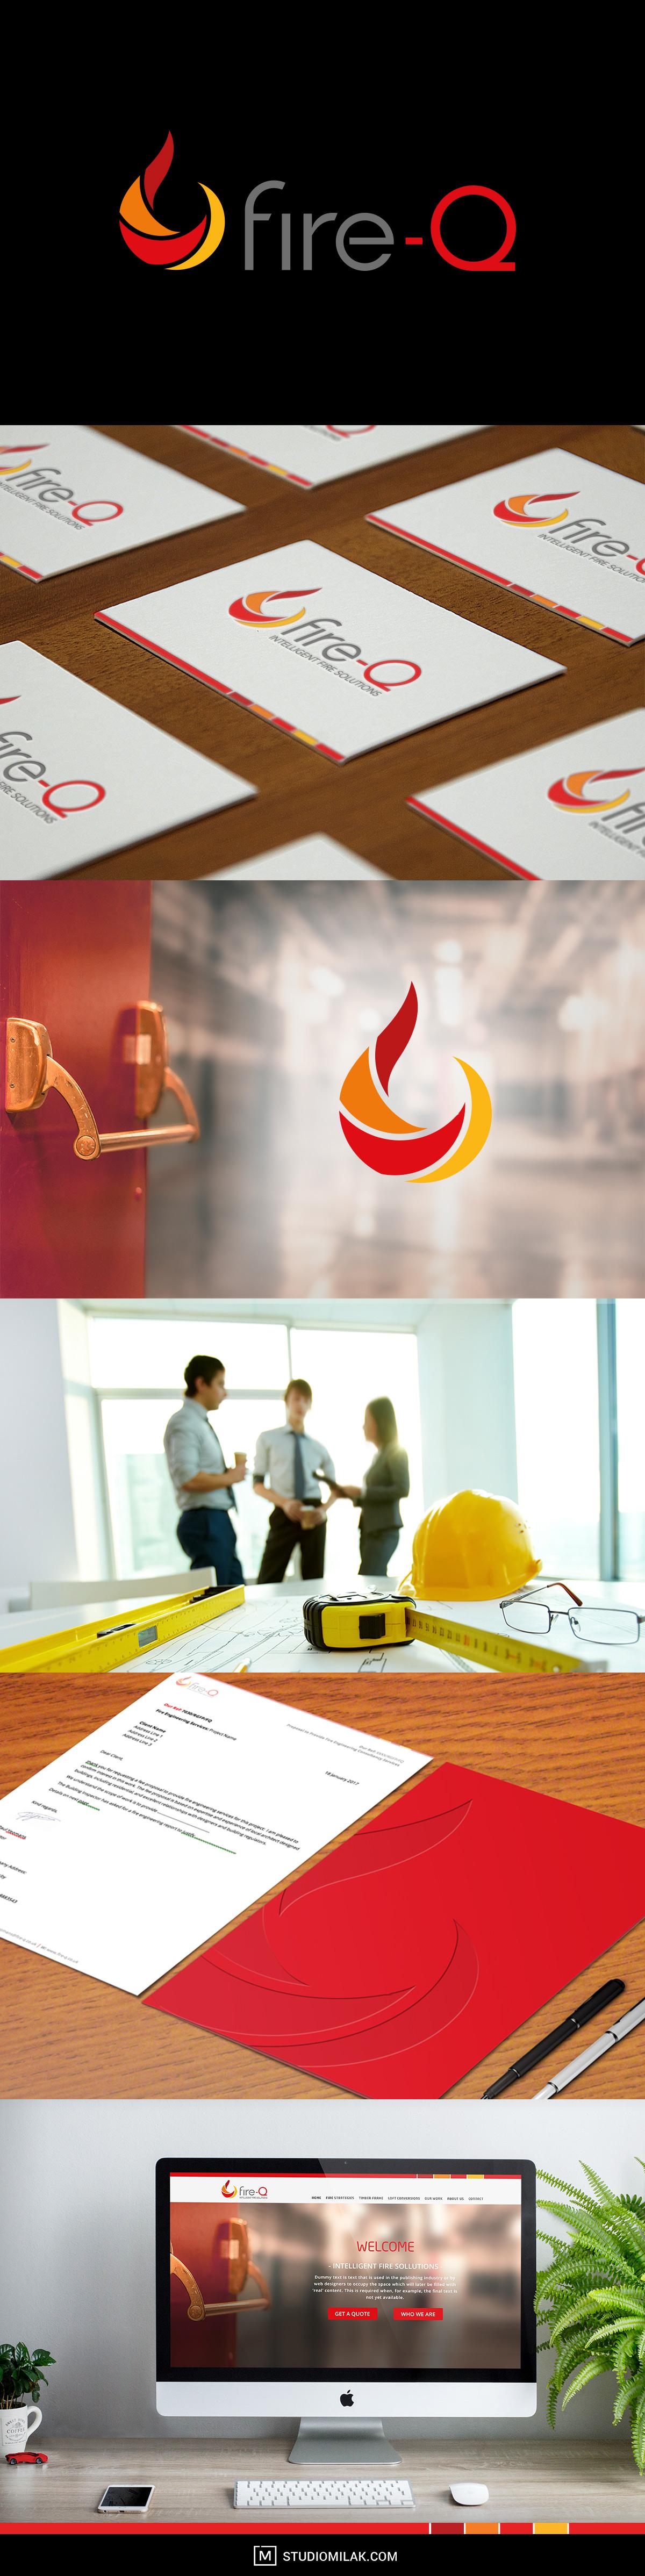 StudioMilak-FireQ-branding.jpg